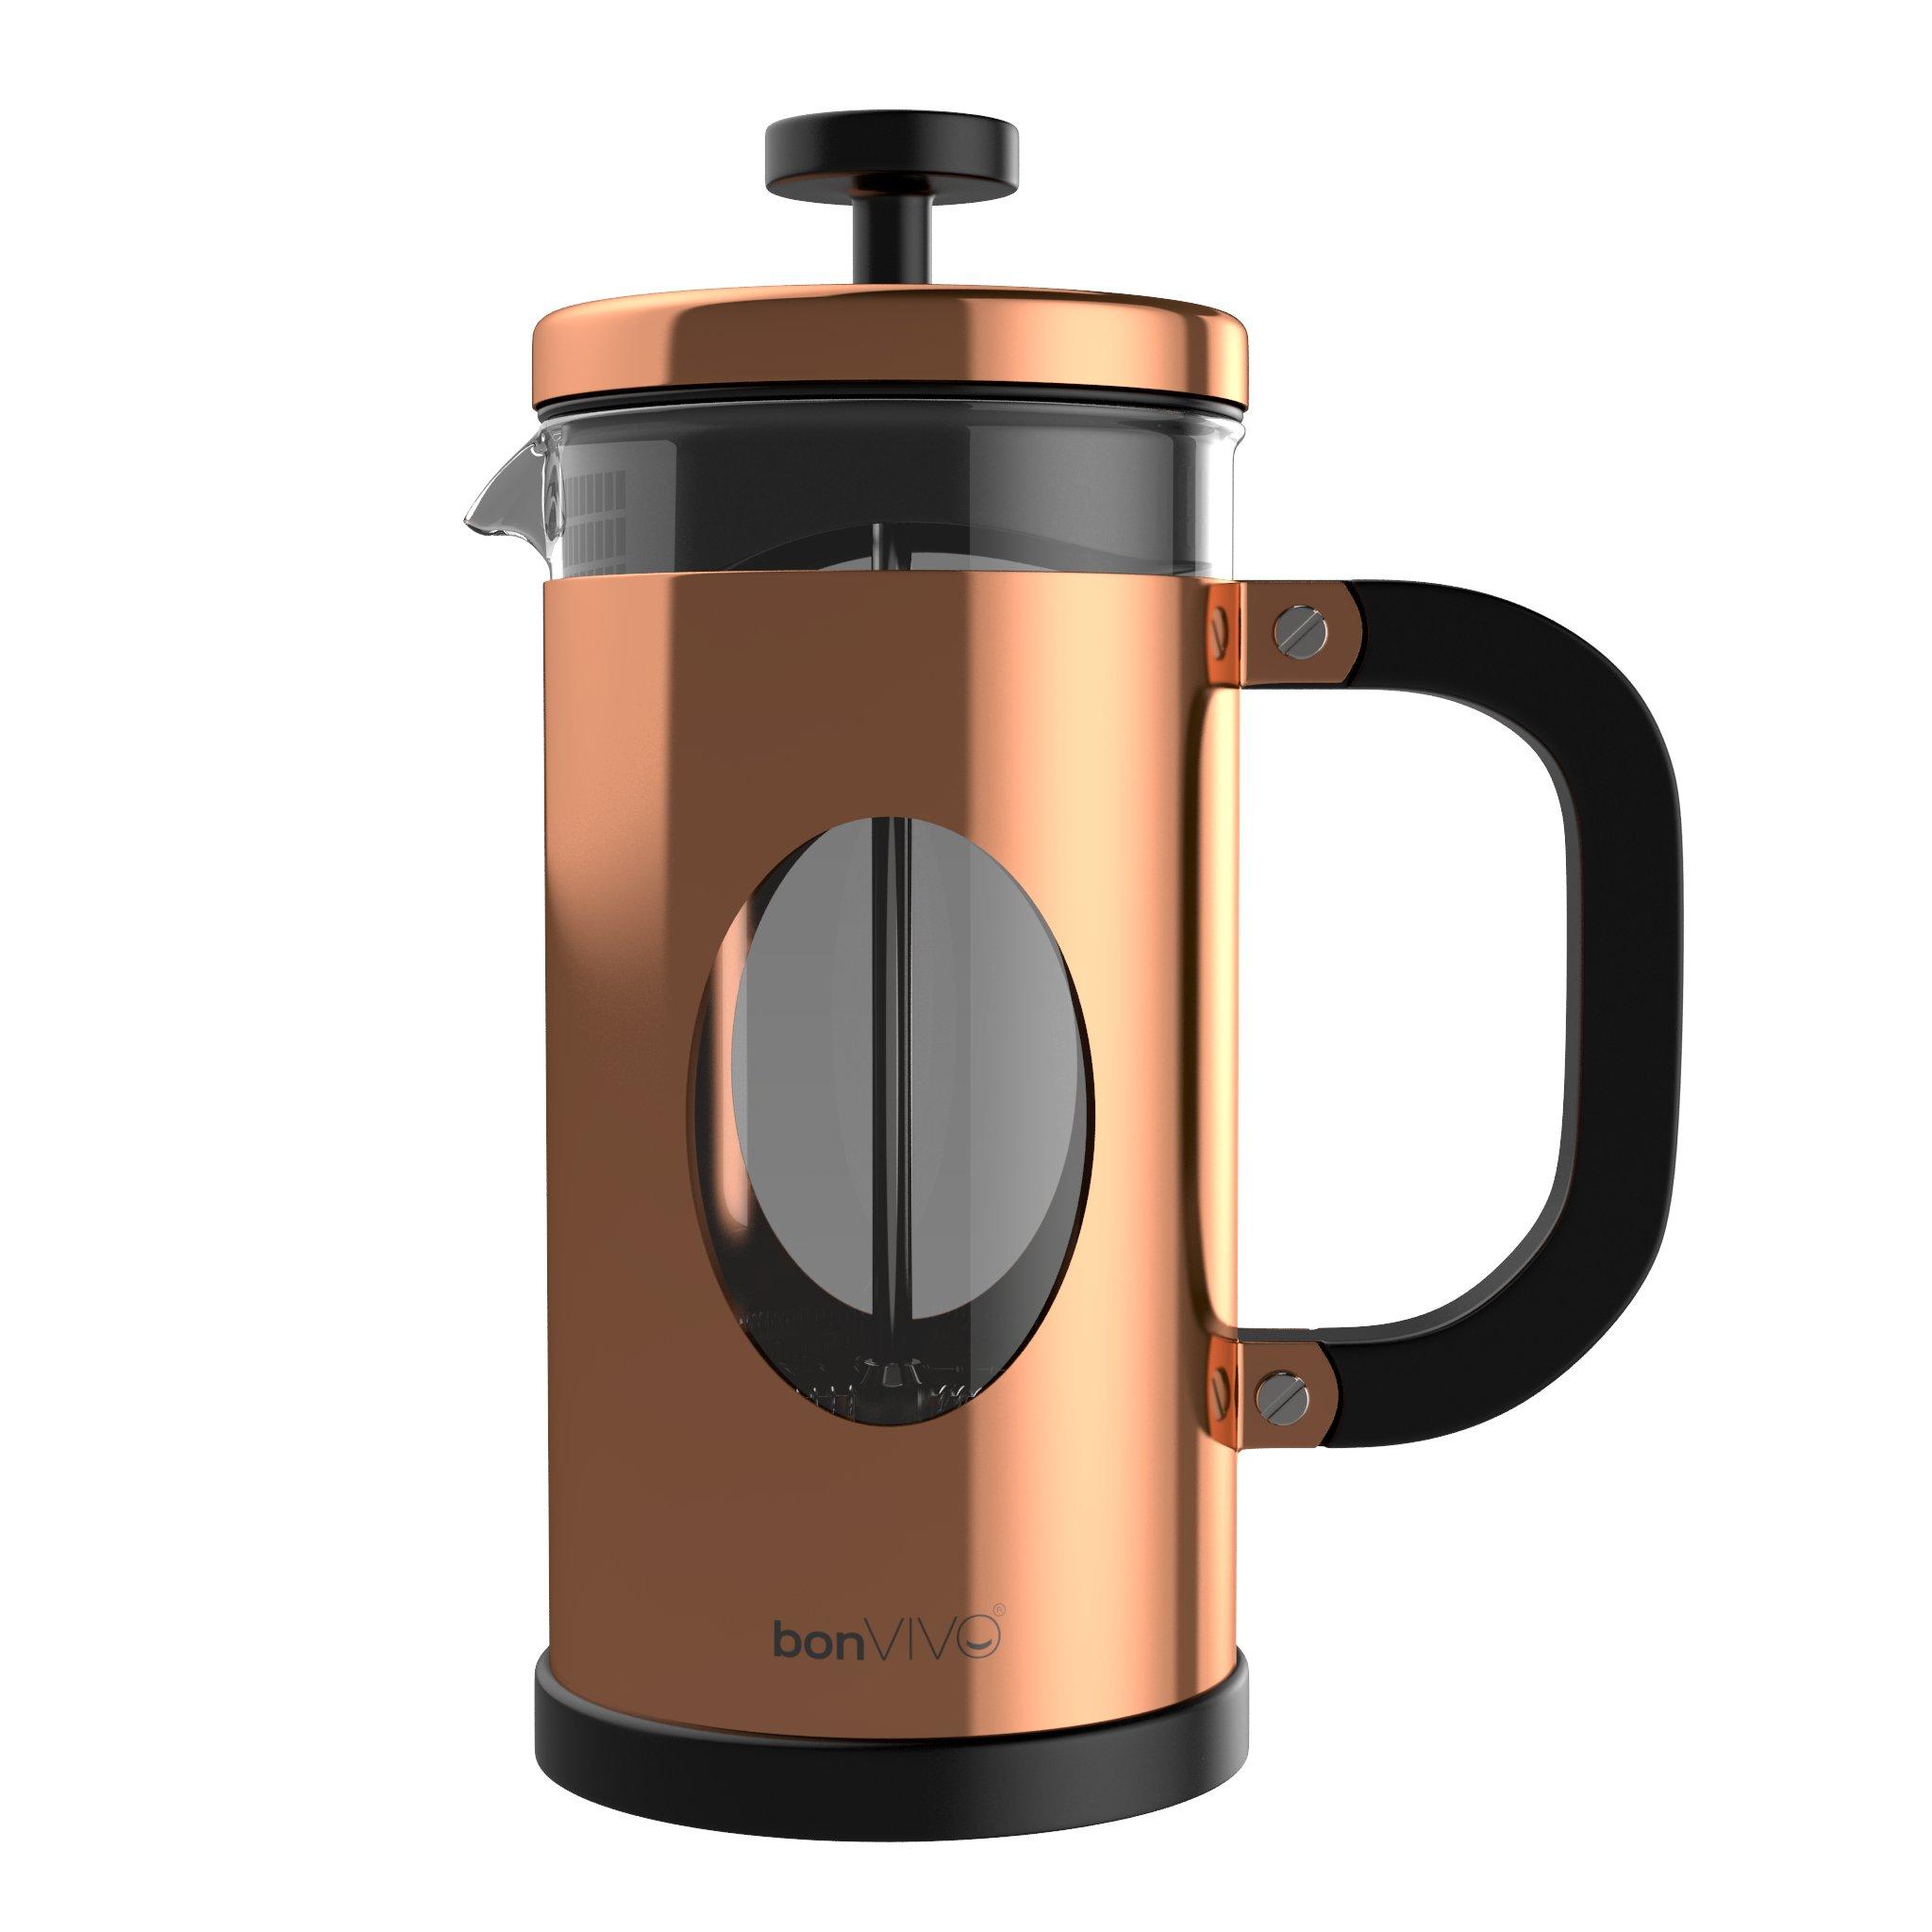 bonVIVO GAZETARO I Copper French Press Coffee Maker, Coffee Press Made Of Stainless Steel And Heat Resistant Borosilicate Glass, Design French Press Machine In Copper Finish, With Bonus Filter, 34 Oz